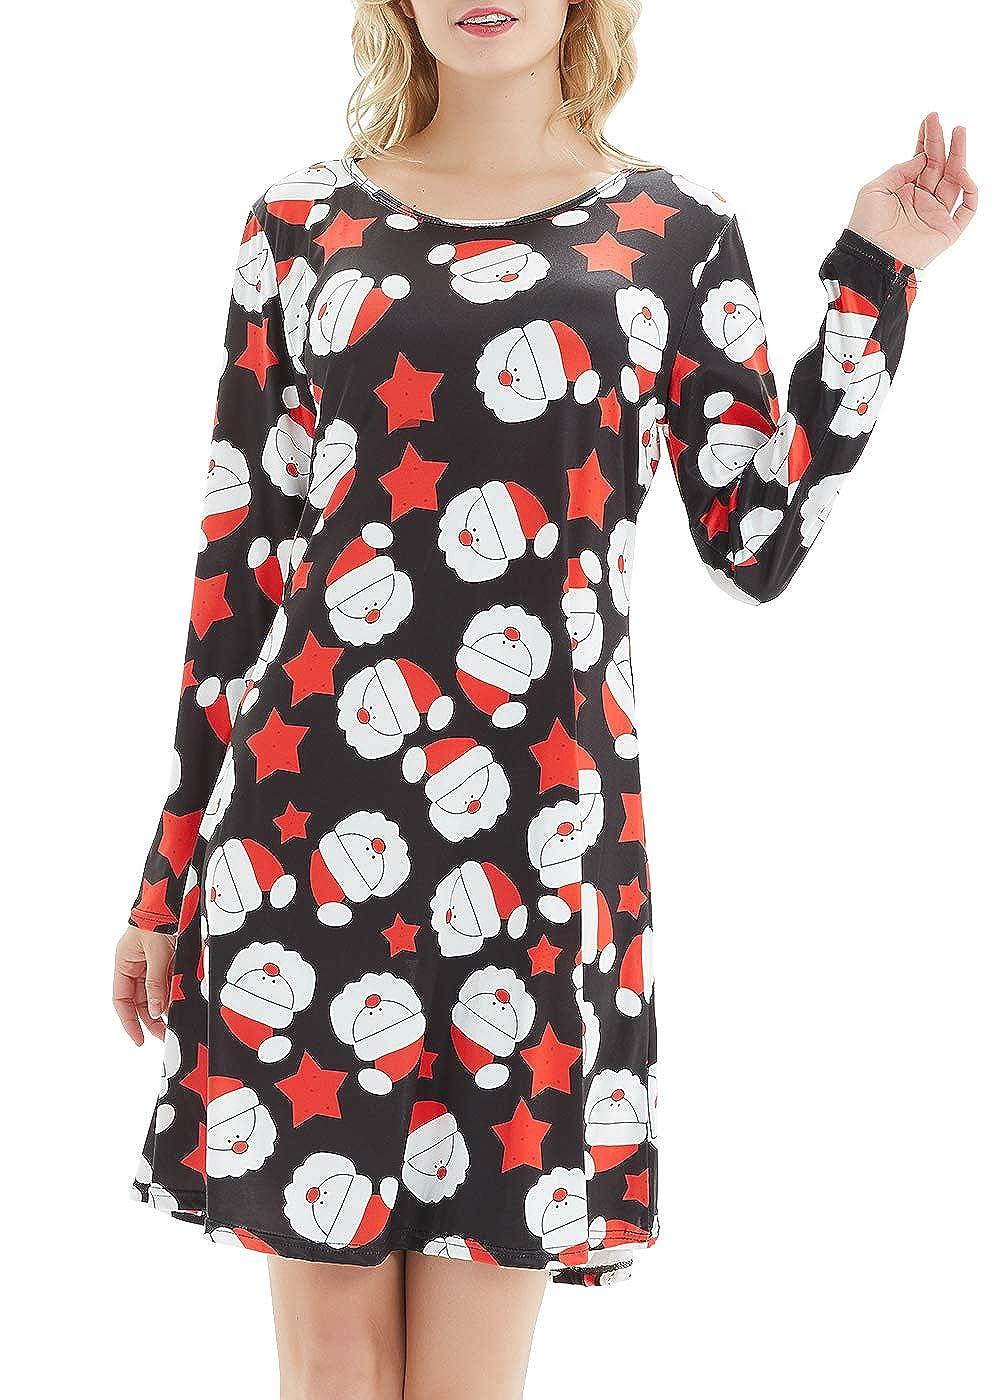 TWKIOUE Women's Christmas Long Sleeve Print Casual Dress